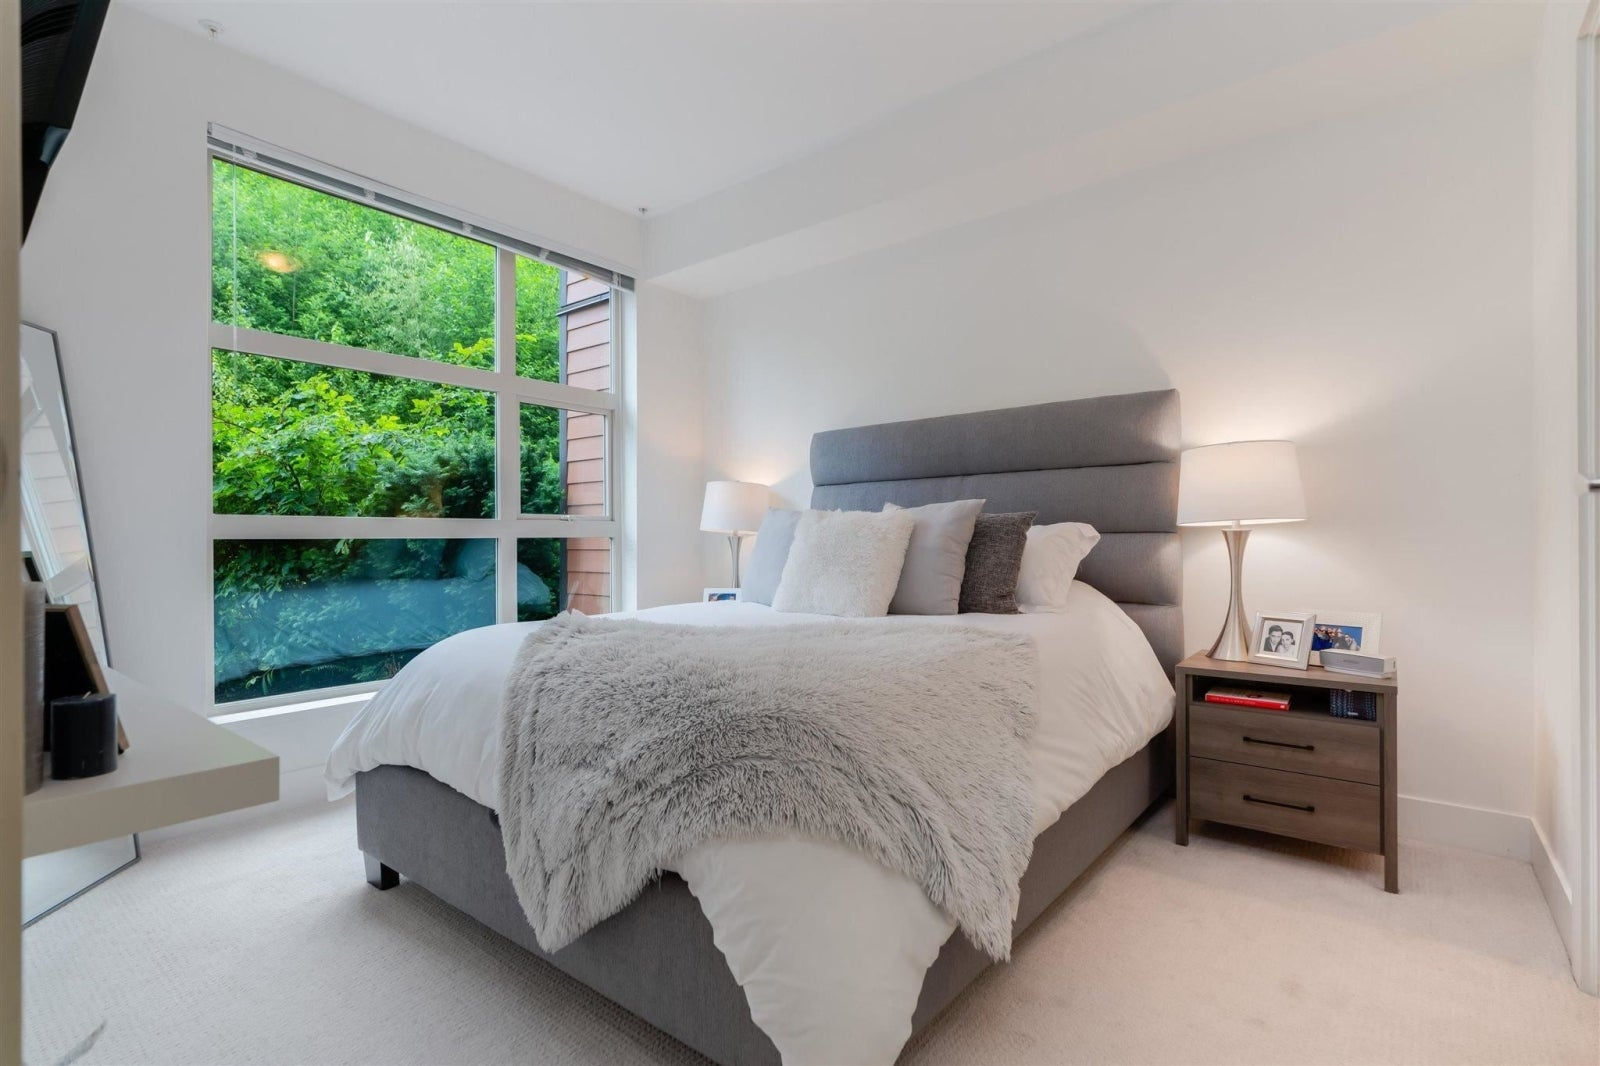 222 3602 ALDERCREST DRIVE - Roche Point Apartment/Condo for sale, 2 Bedrooms (R2603975) #11